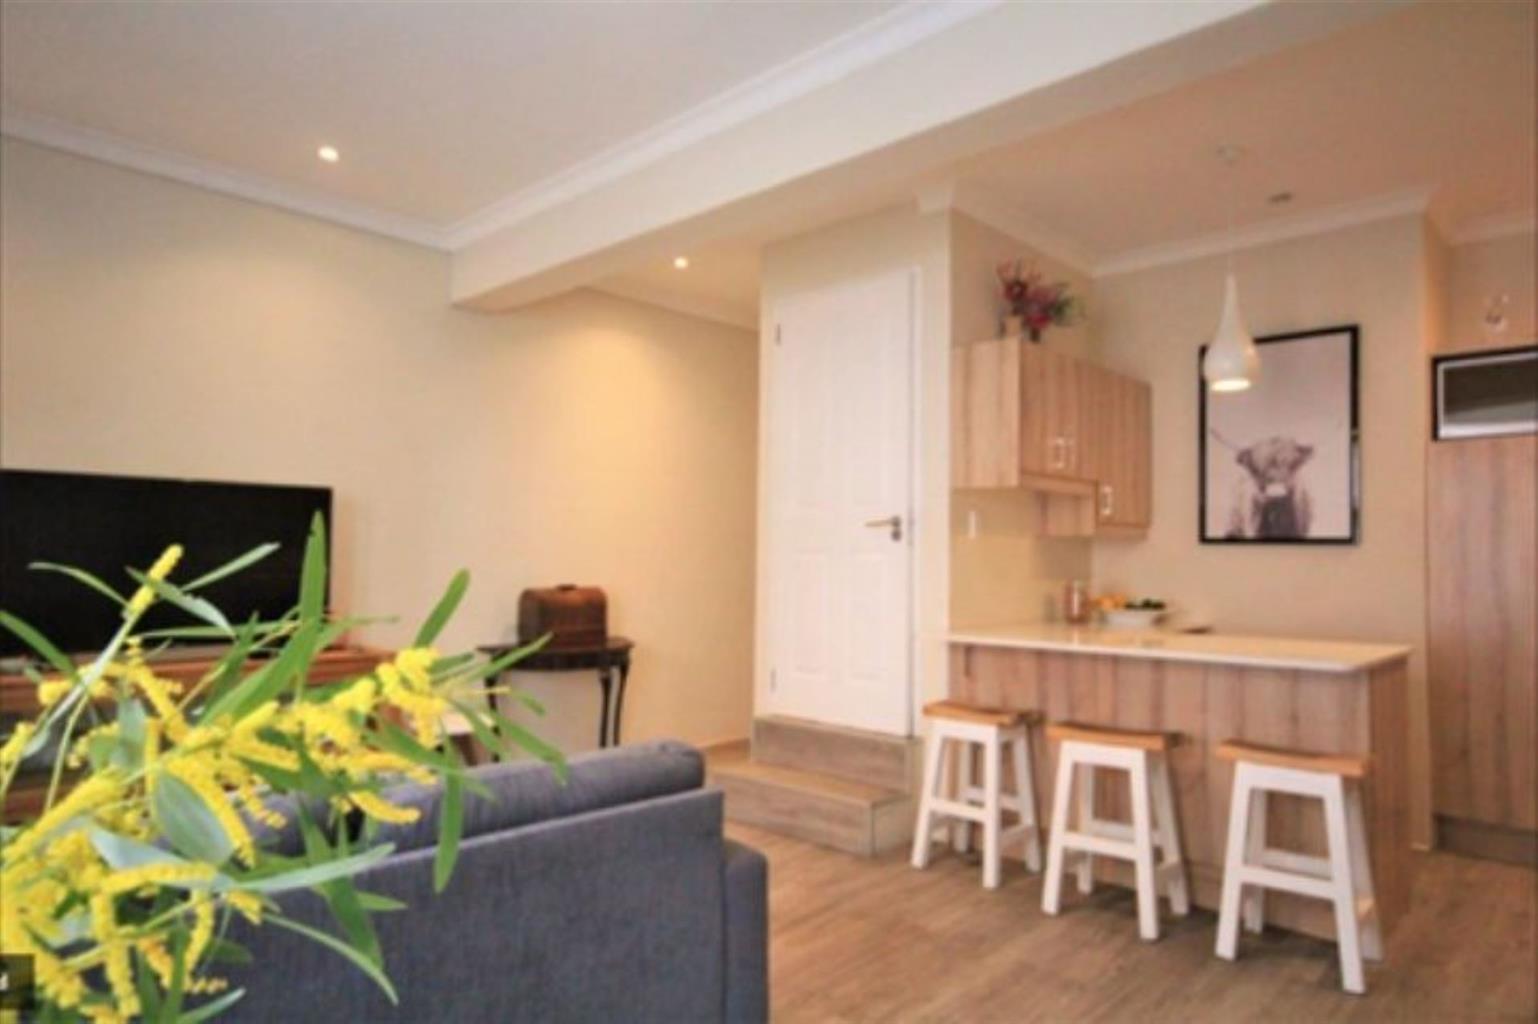 House Rental Monthly in WOODSTOCK UPPER